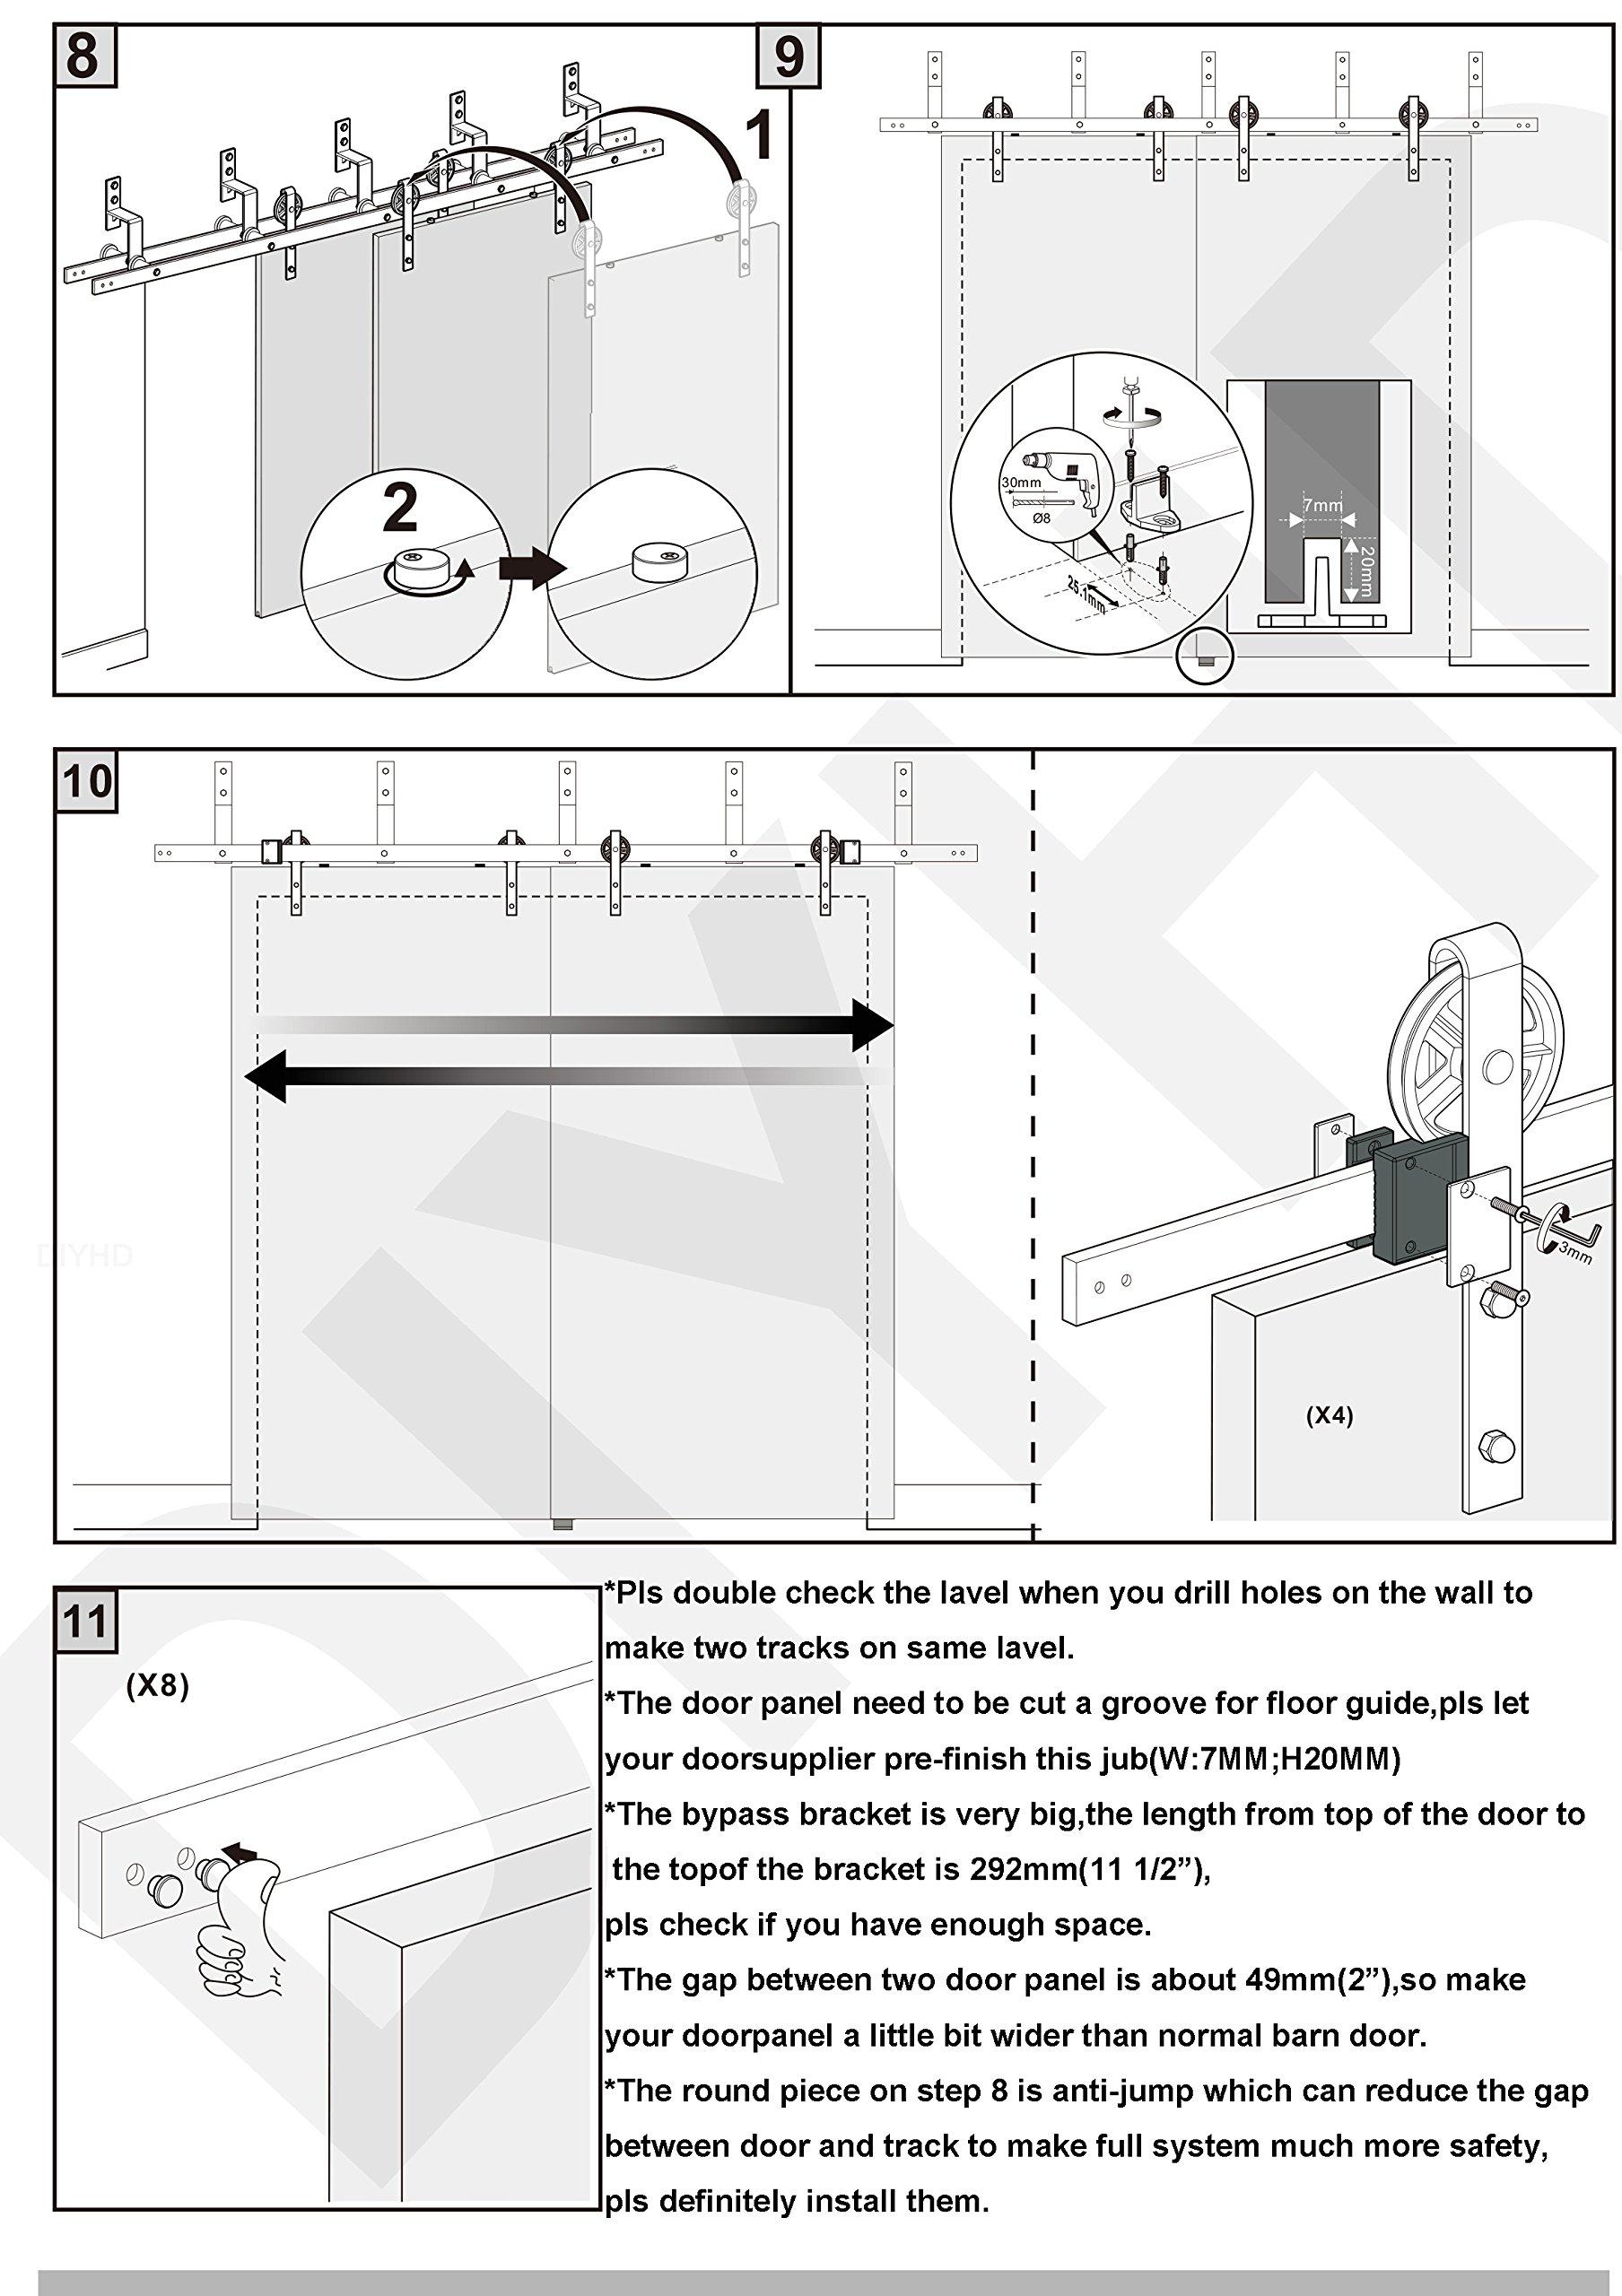 DIYHD 8ft Industrial Spoke Wheel Bypass Barn Door Track Stablest Bypass Sliding Door Hardware by DIYHD